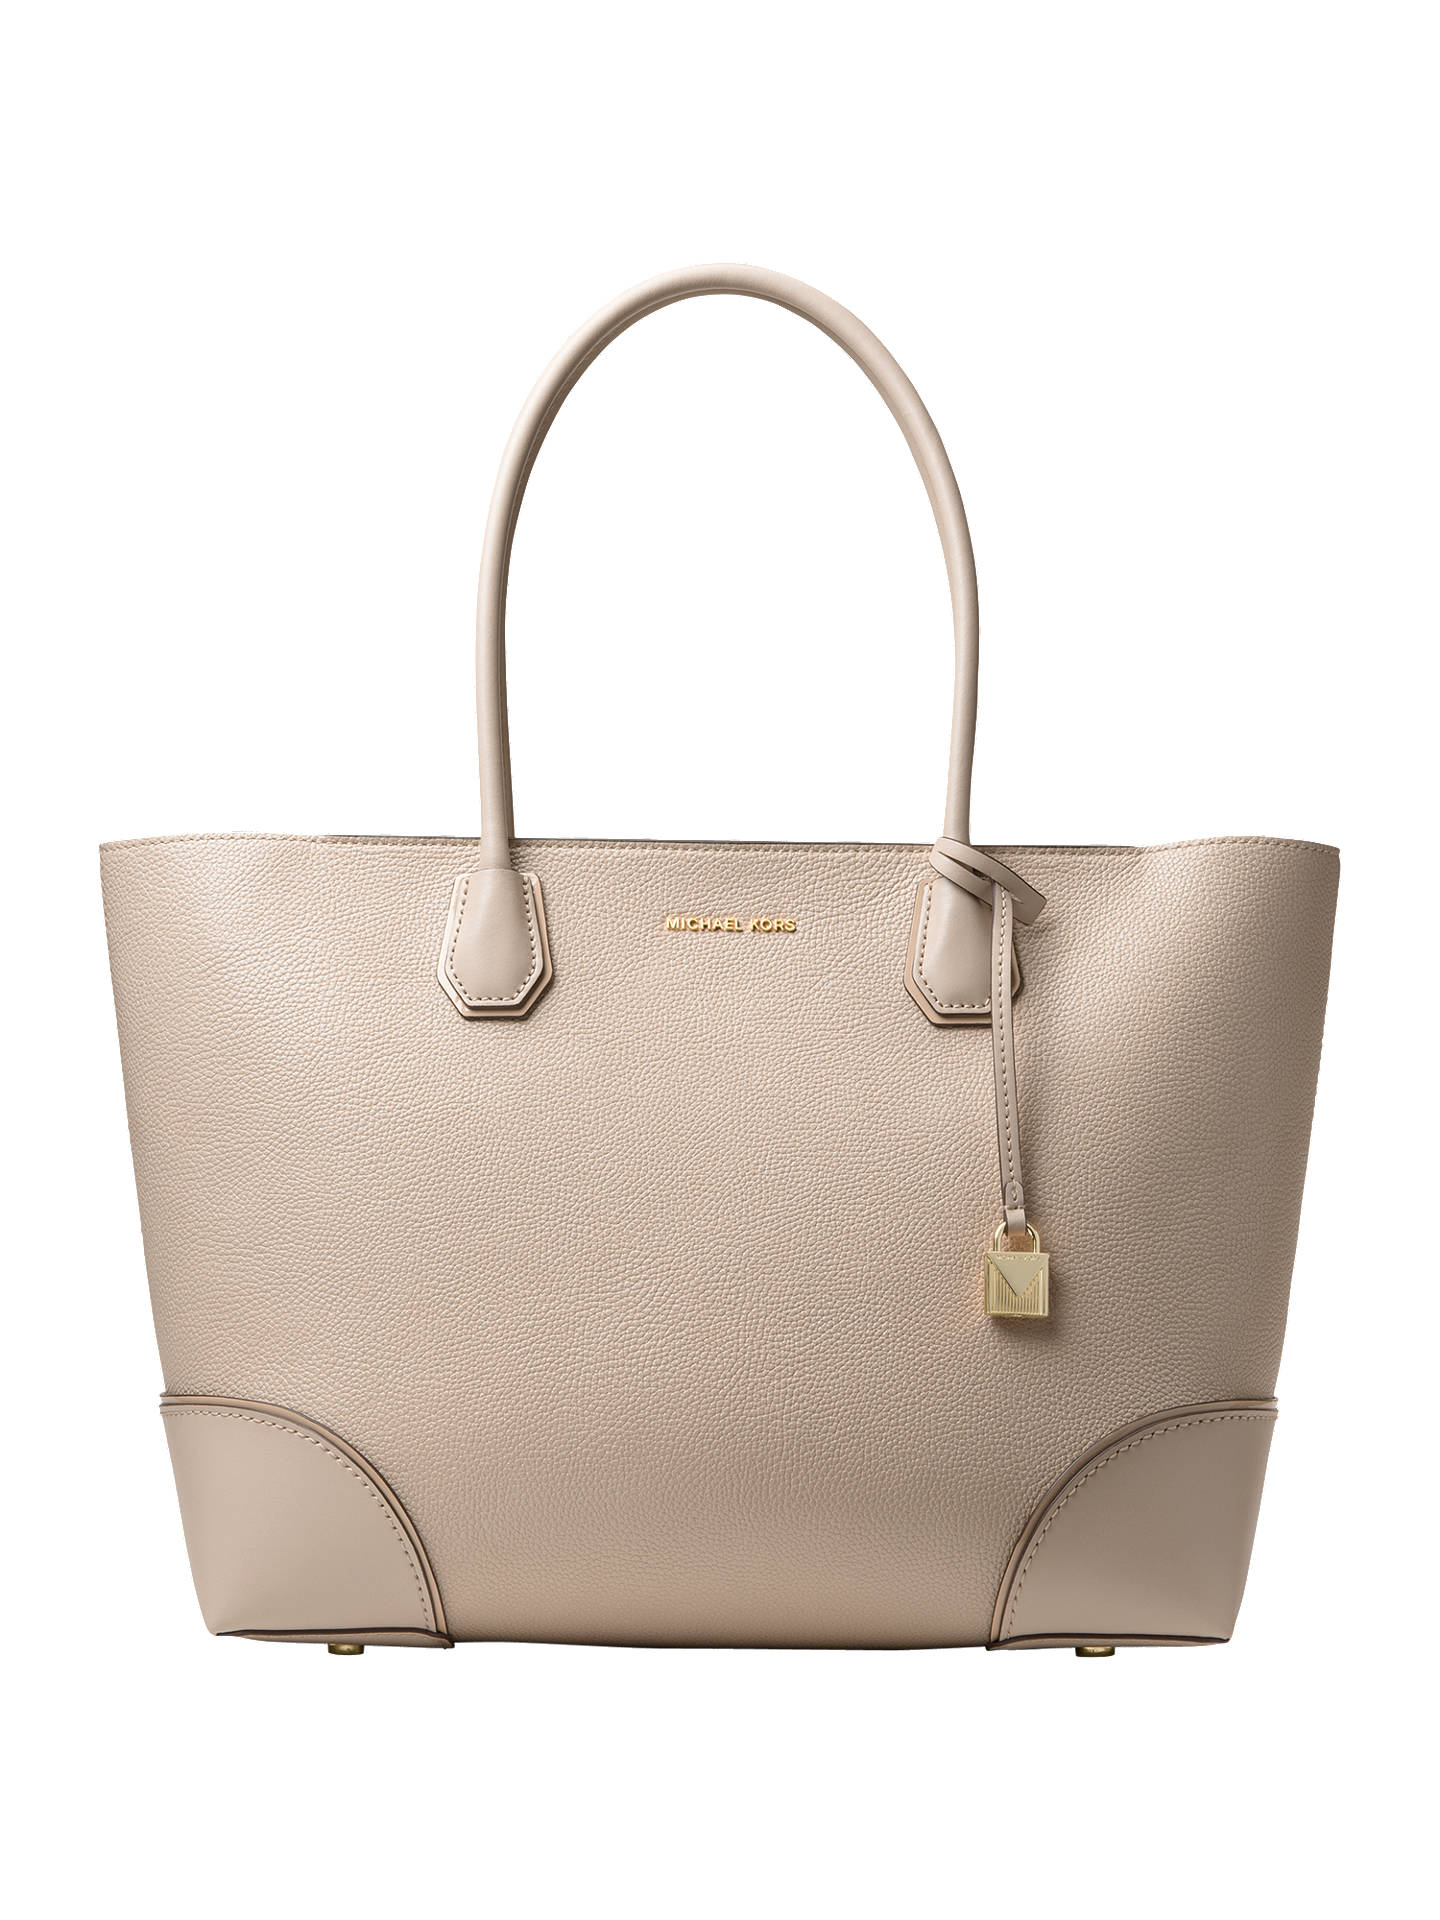 c9cf71bbe960 Buy MICHAEL Michael Kors Mercer Large East West Leather Tote Bag, Oat  Online at johnlewis ...